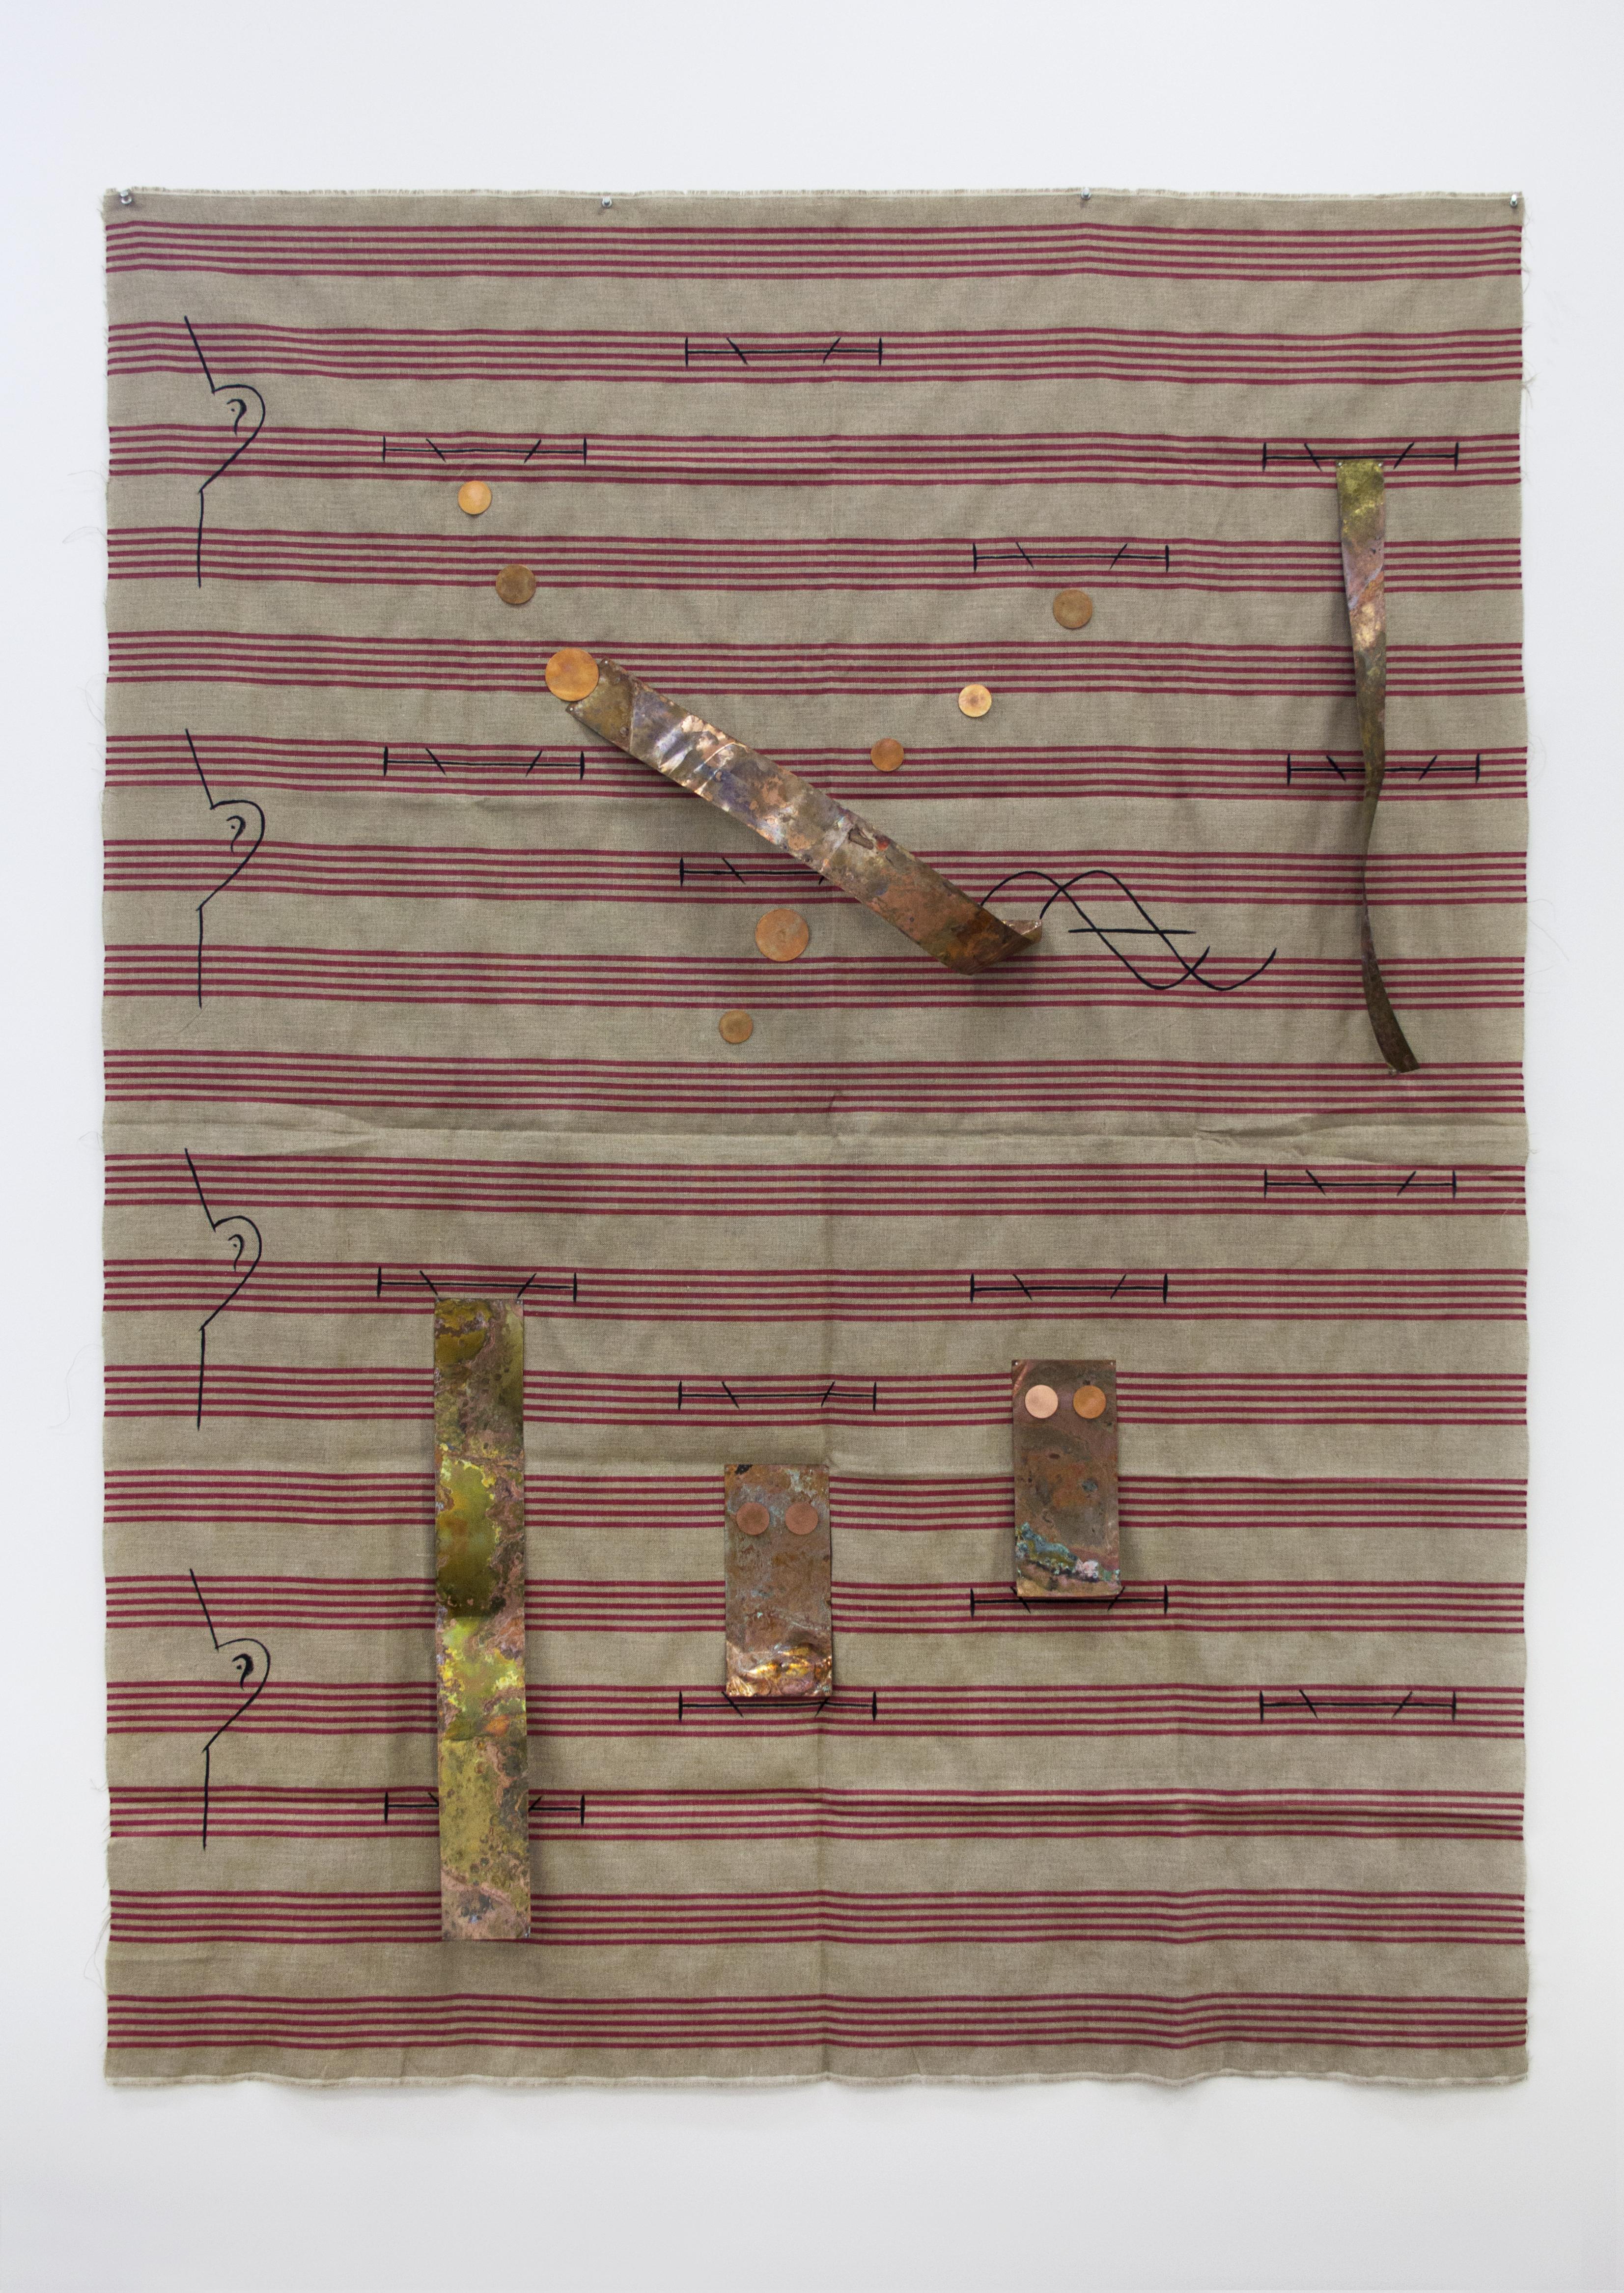 Sergei Tcherepnin, Ear Blocks, 2015, gouache on linen, copper, 72 x 54 inches